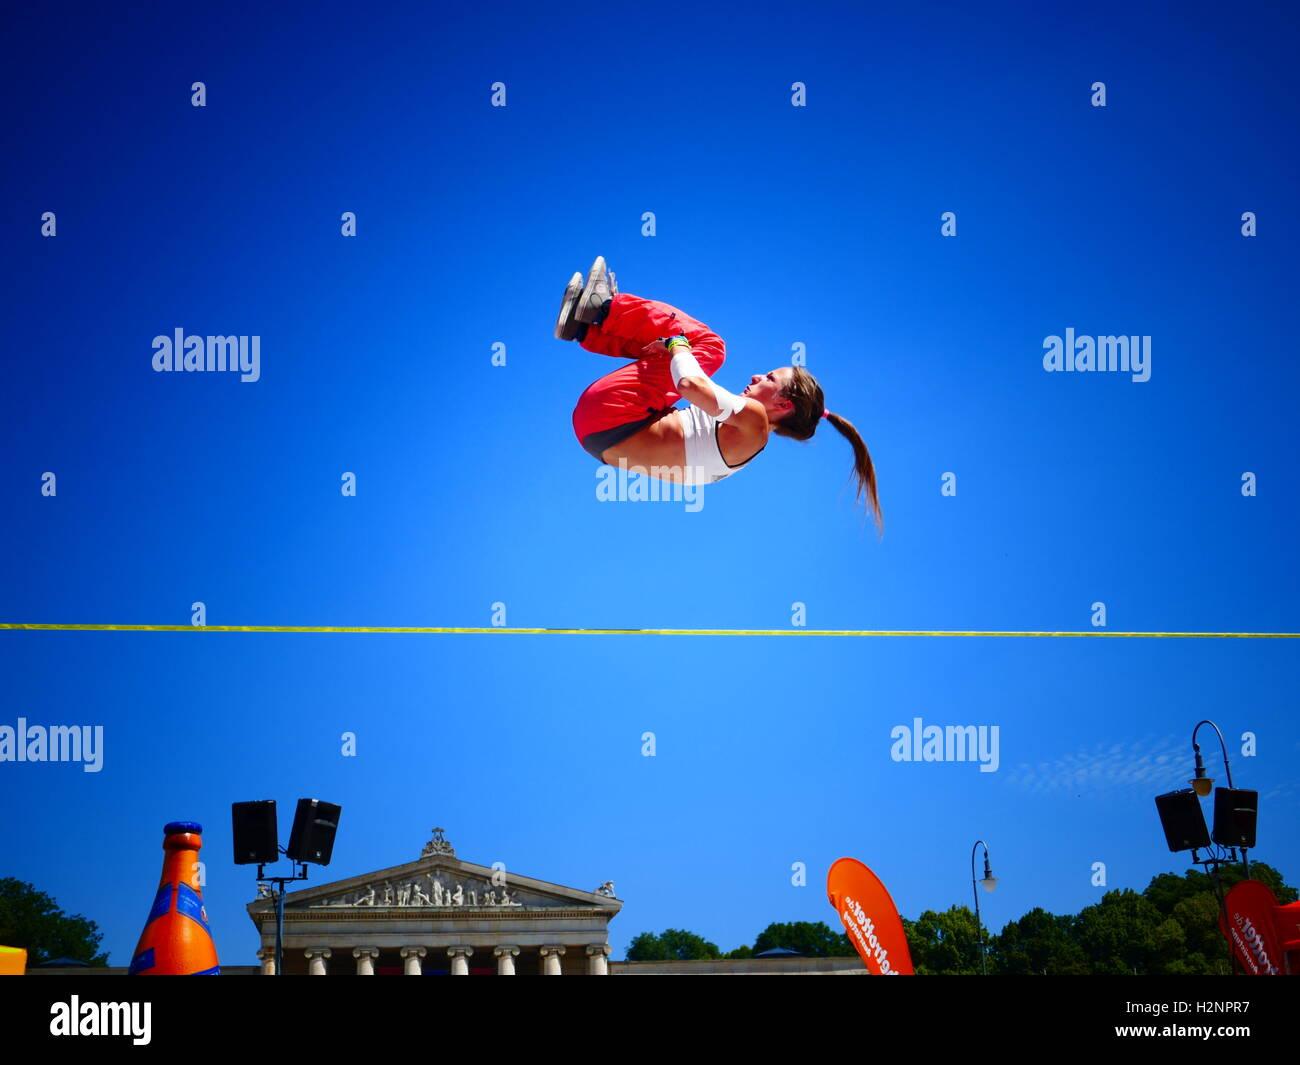 Slackliner compete in Slackline sport festival Munich Germany Europe Stock Photo